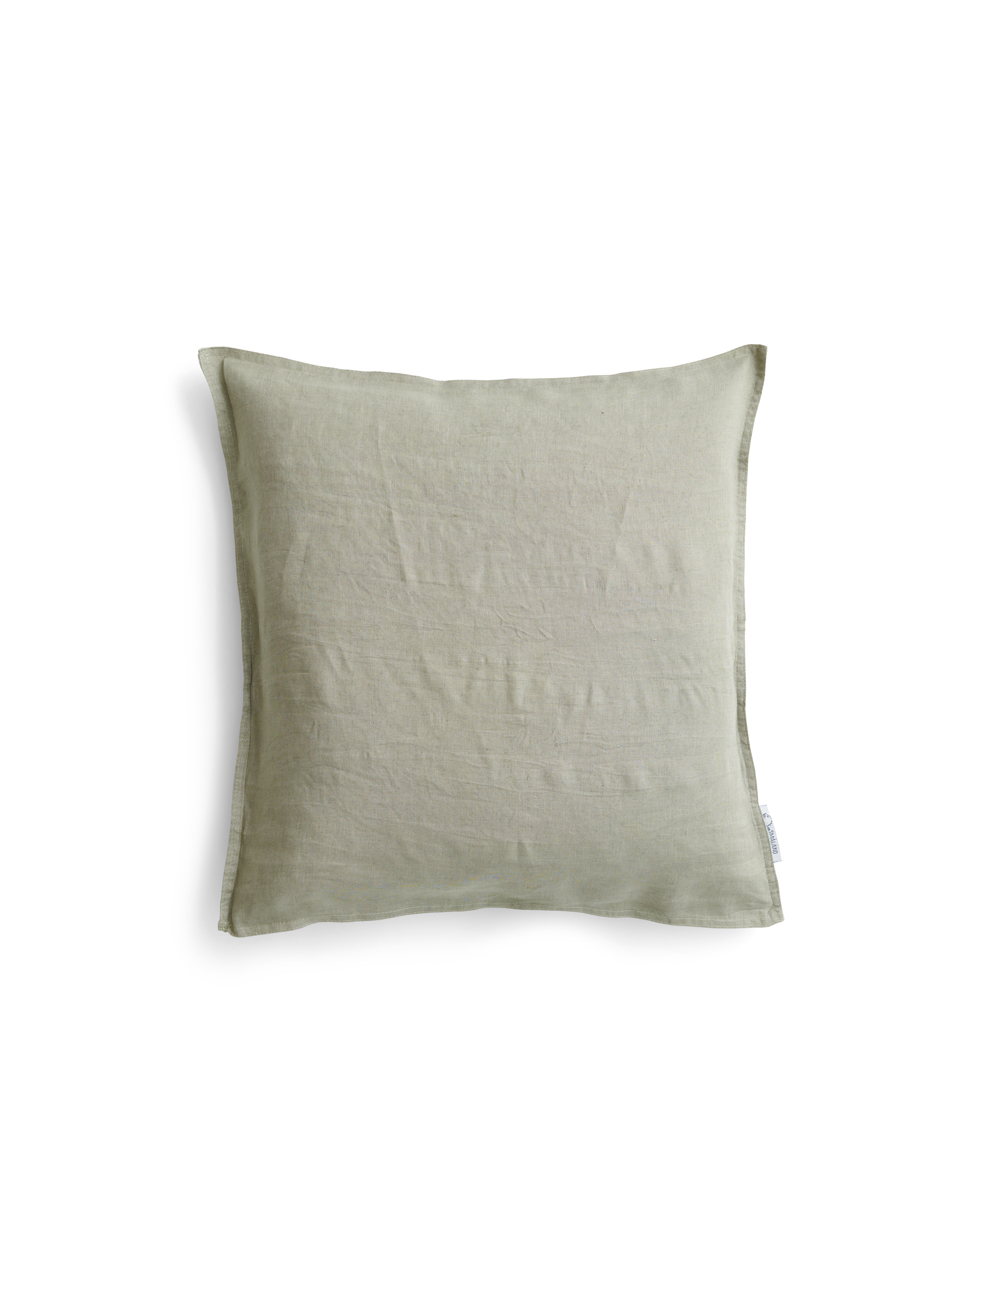 Cushion Cover Linen Sage